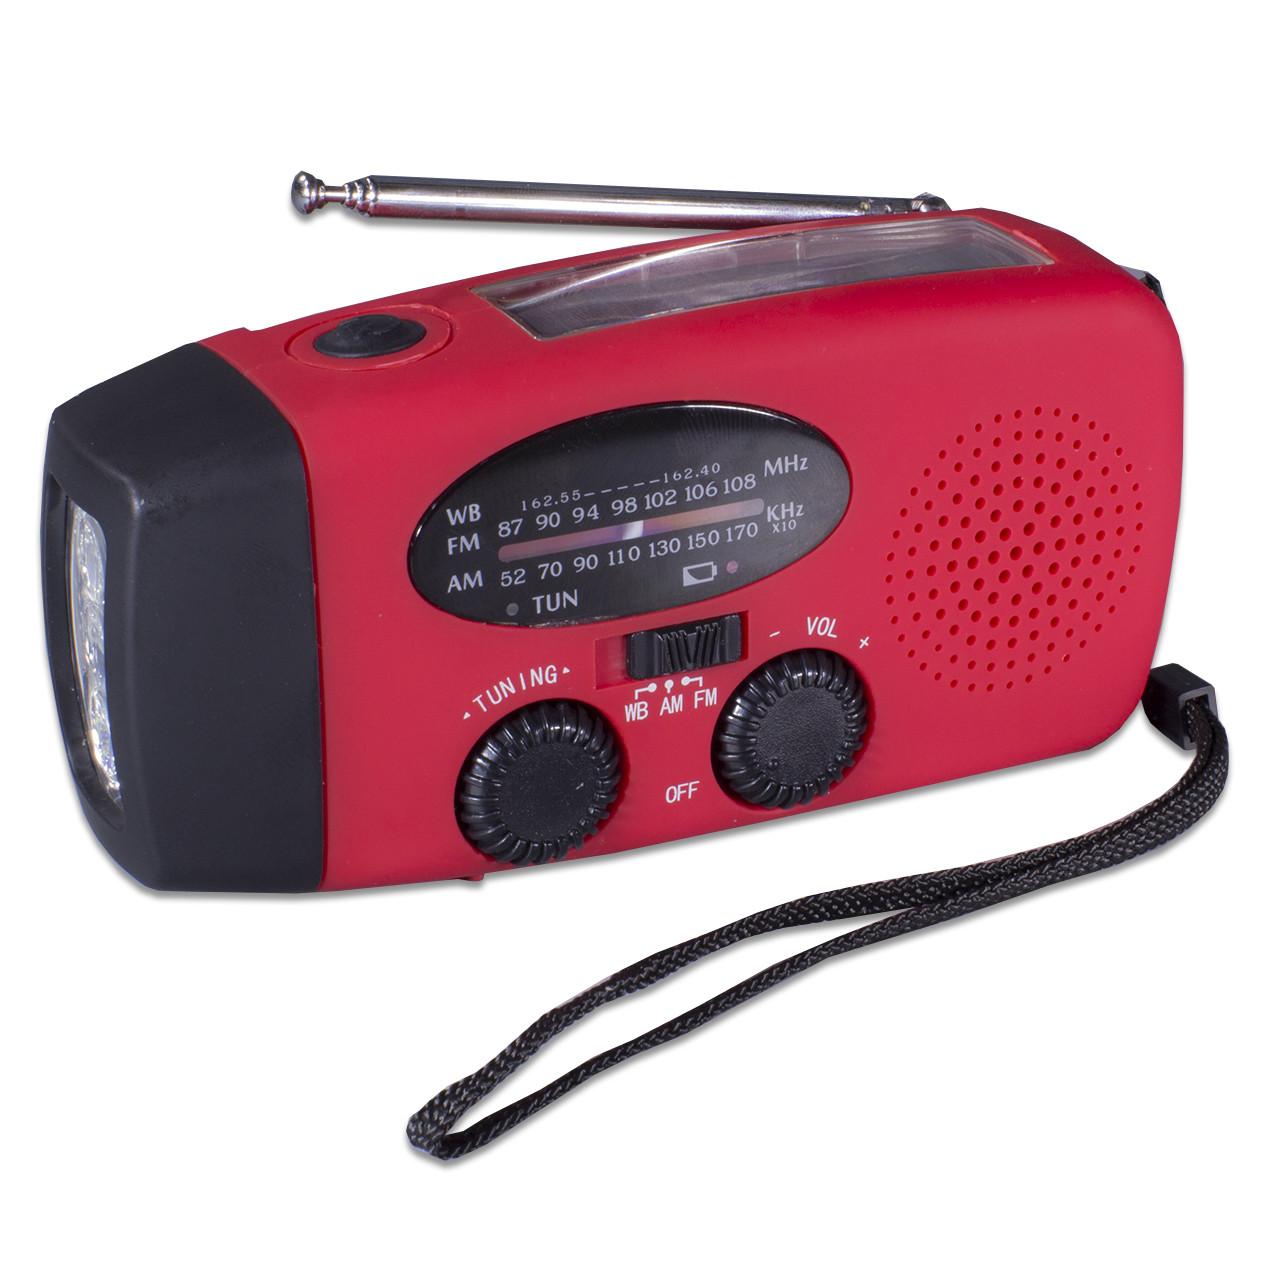 Фонарь Haoyi HY-088WB динамо/радио Red (1642-5969)